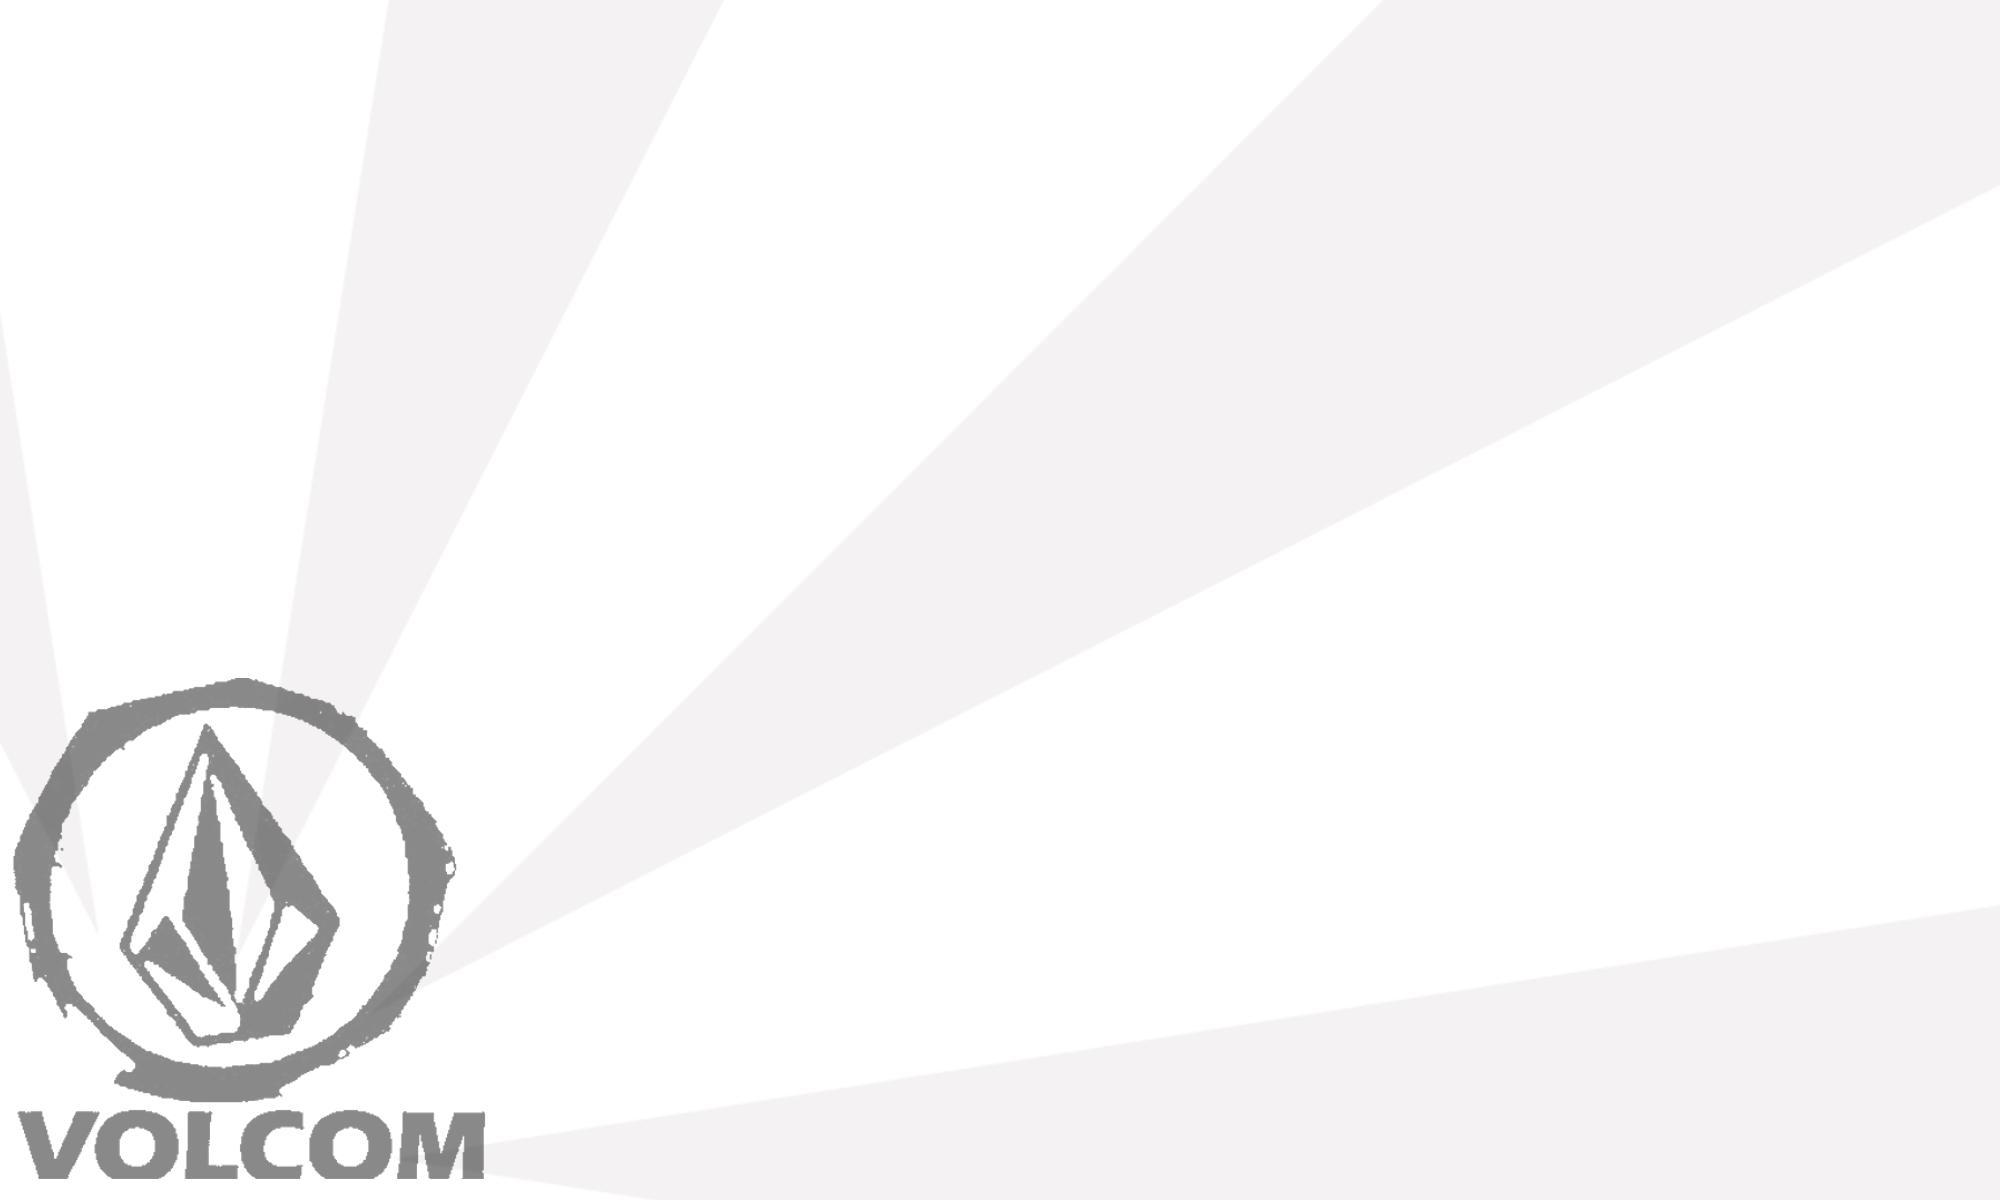 Volcom Graffiti White HD Wallpaper Background Picture Free Download